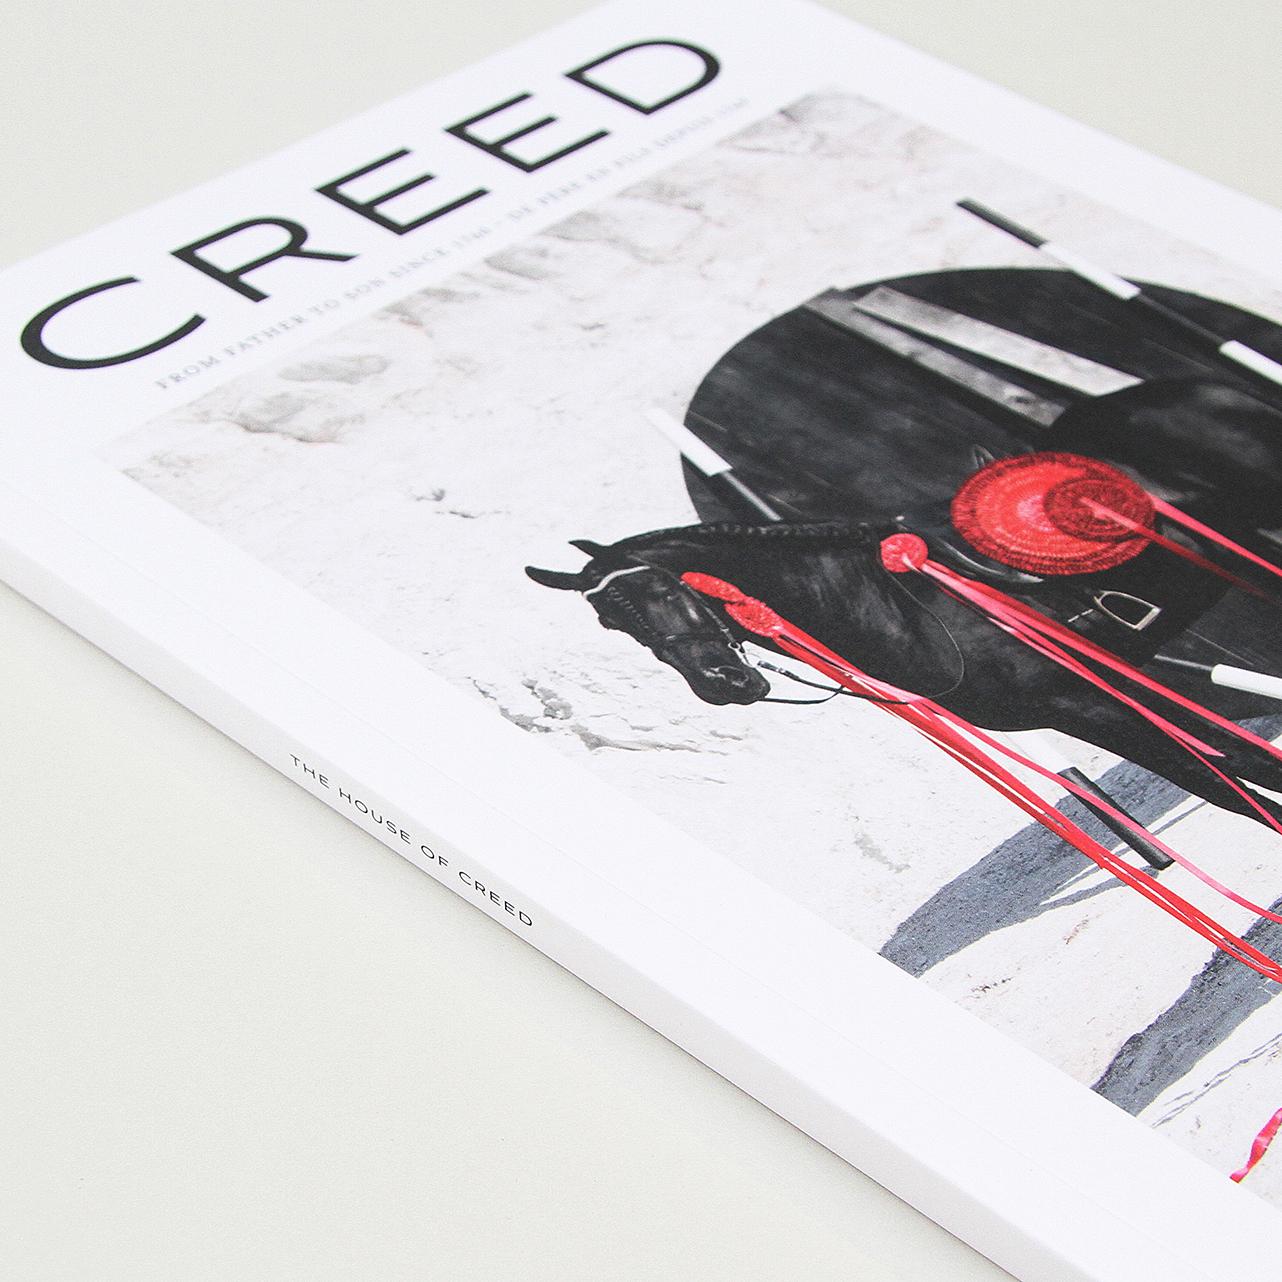 Creed: luxury brand magazine in three languages